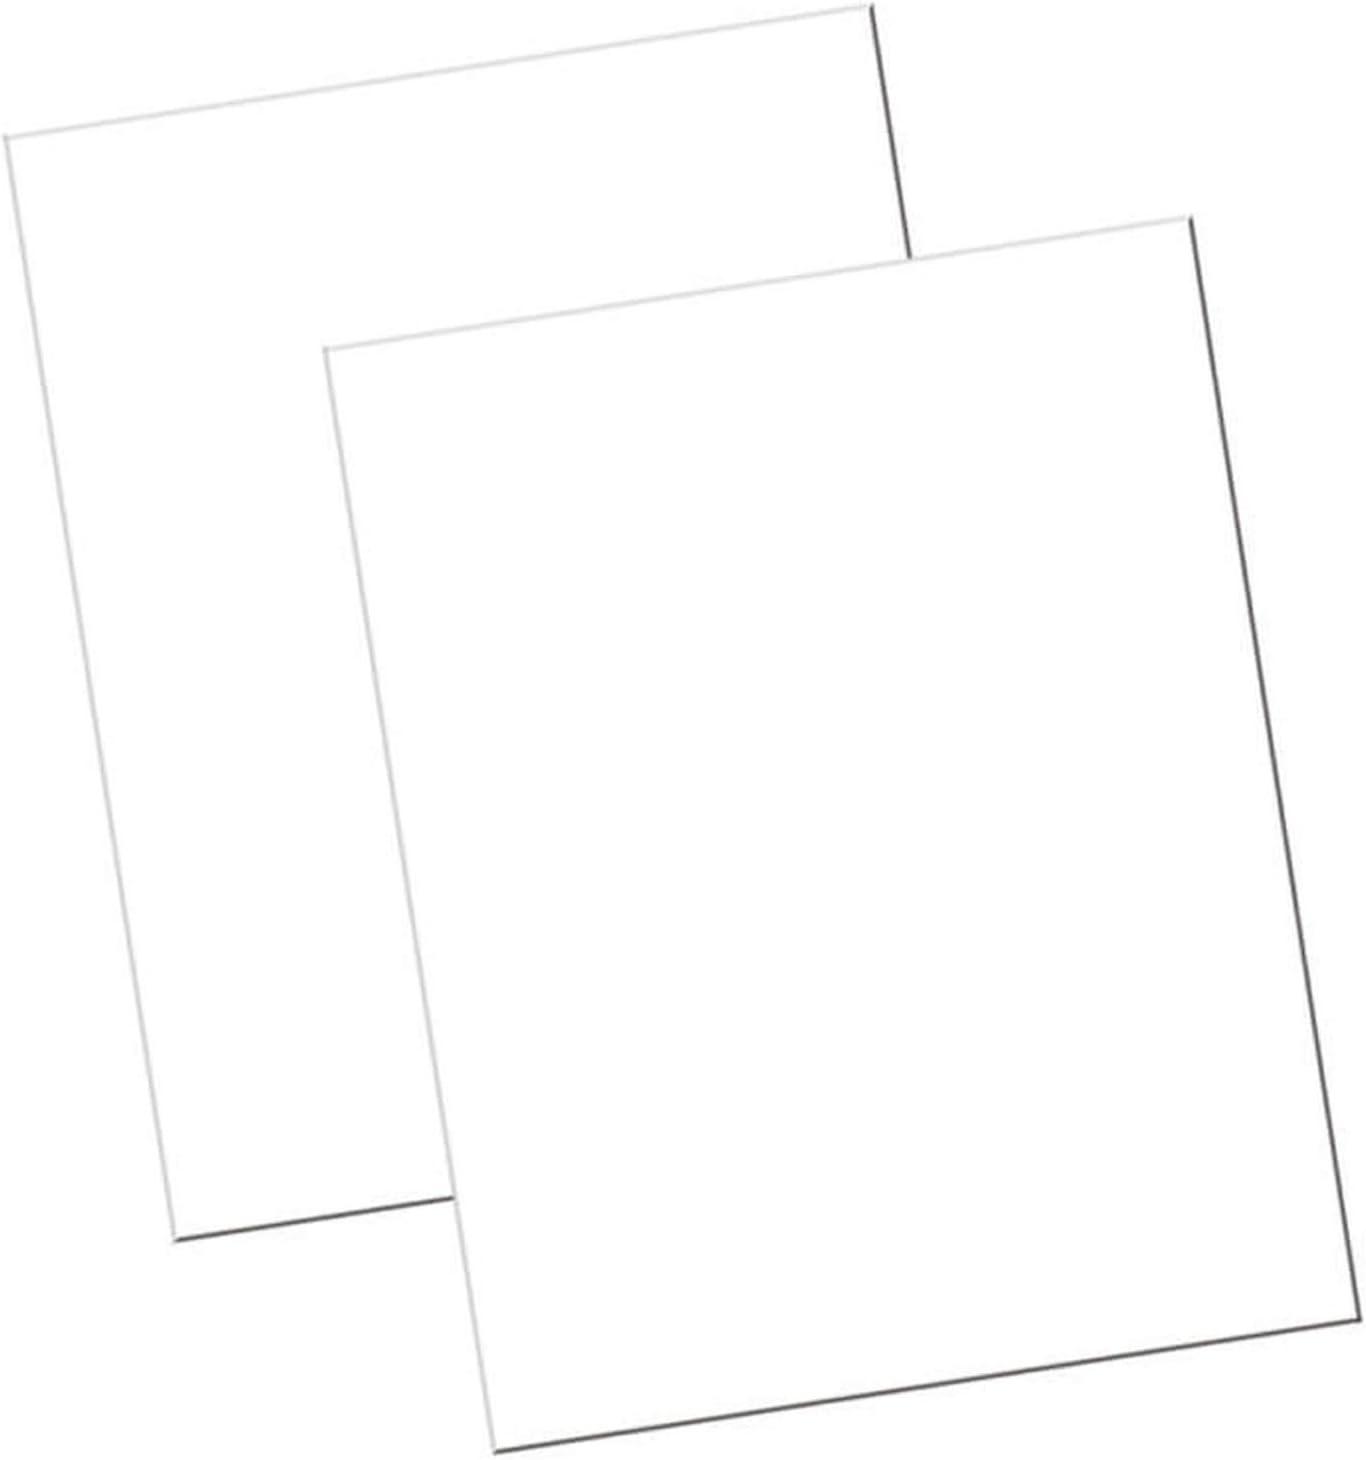 "UCreate Economy Poster Board, White, 22"" x 28"", 100 Sheets/Carton"